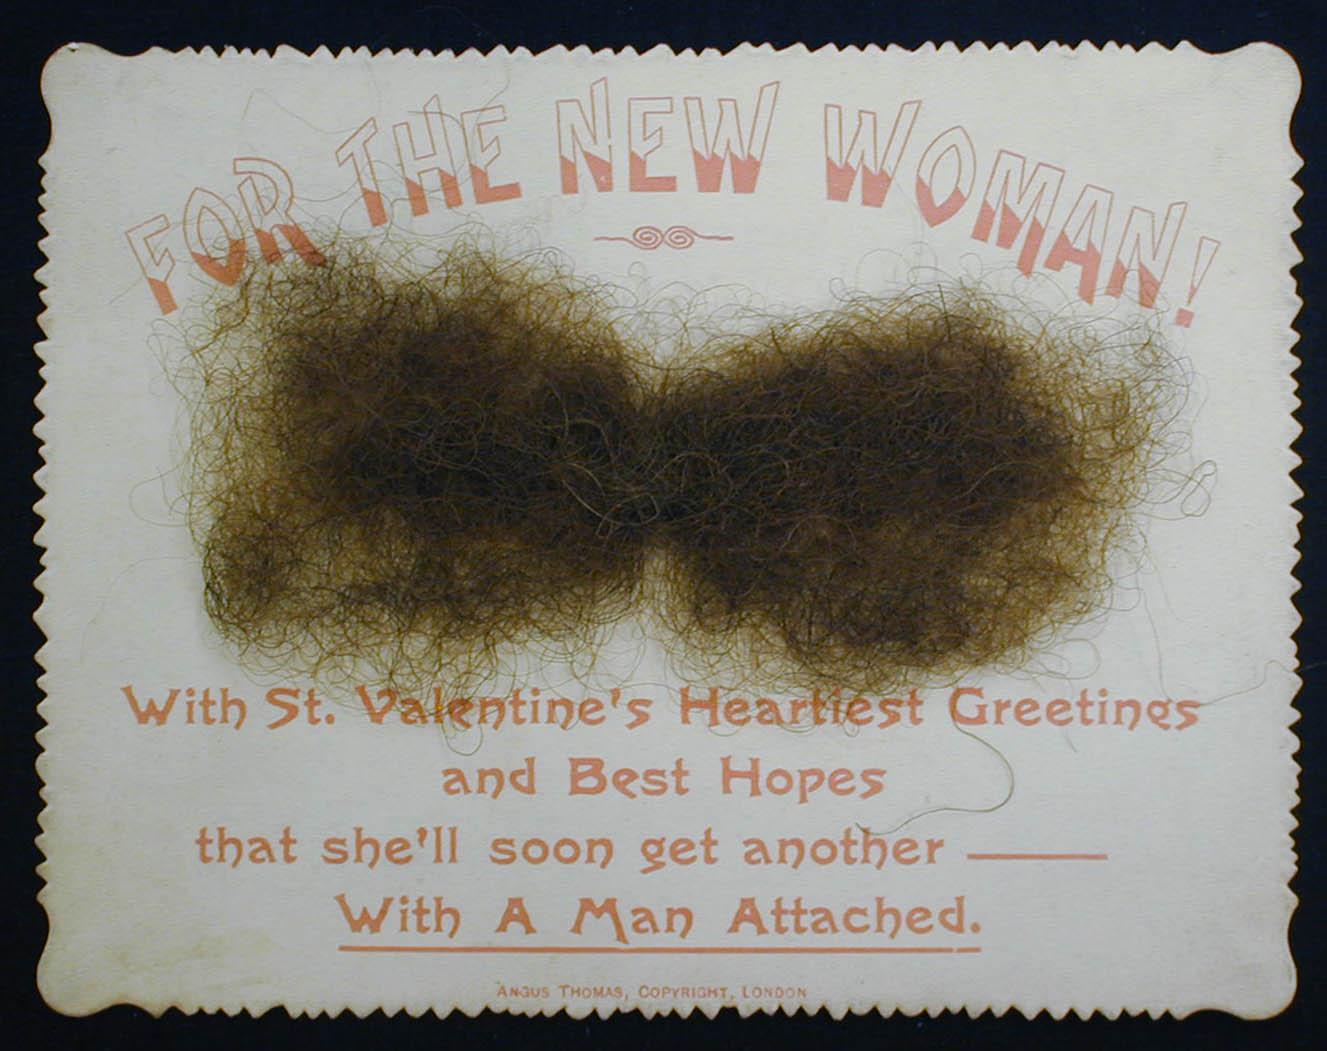 Jokey Victorian era Valentine's Day card daubed with facial hair is 'worst ever'